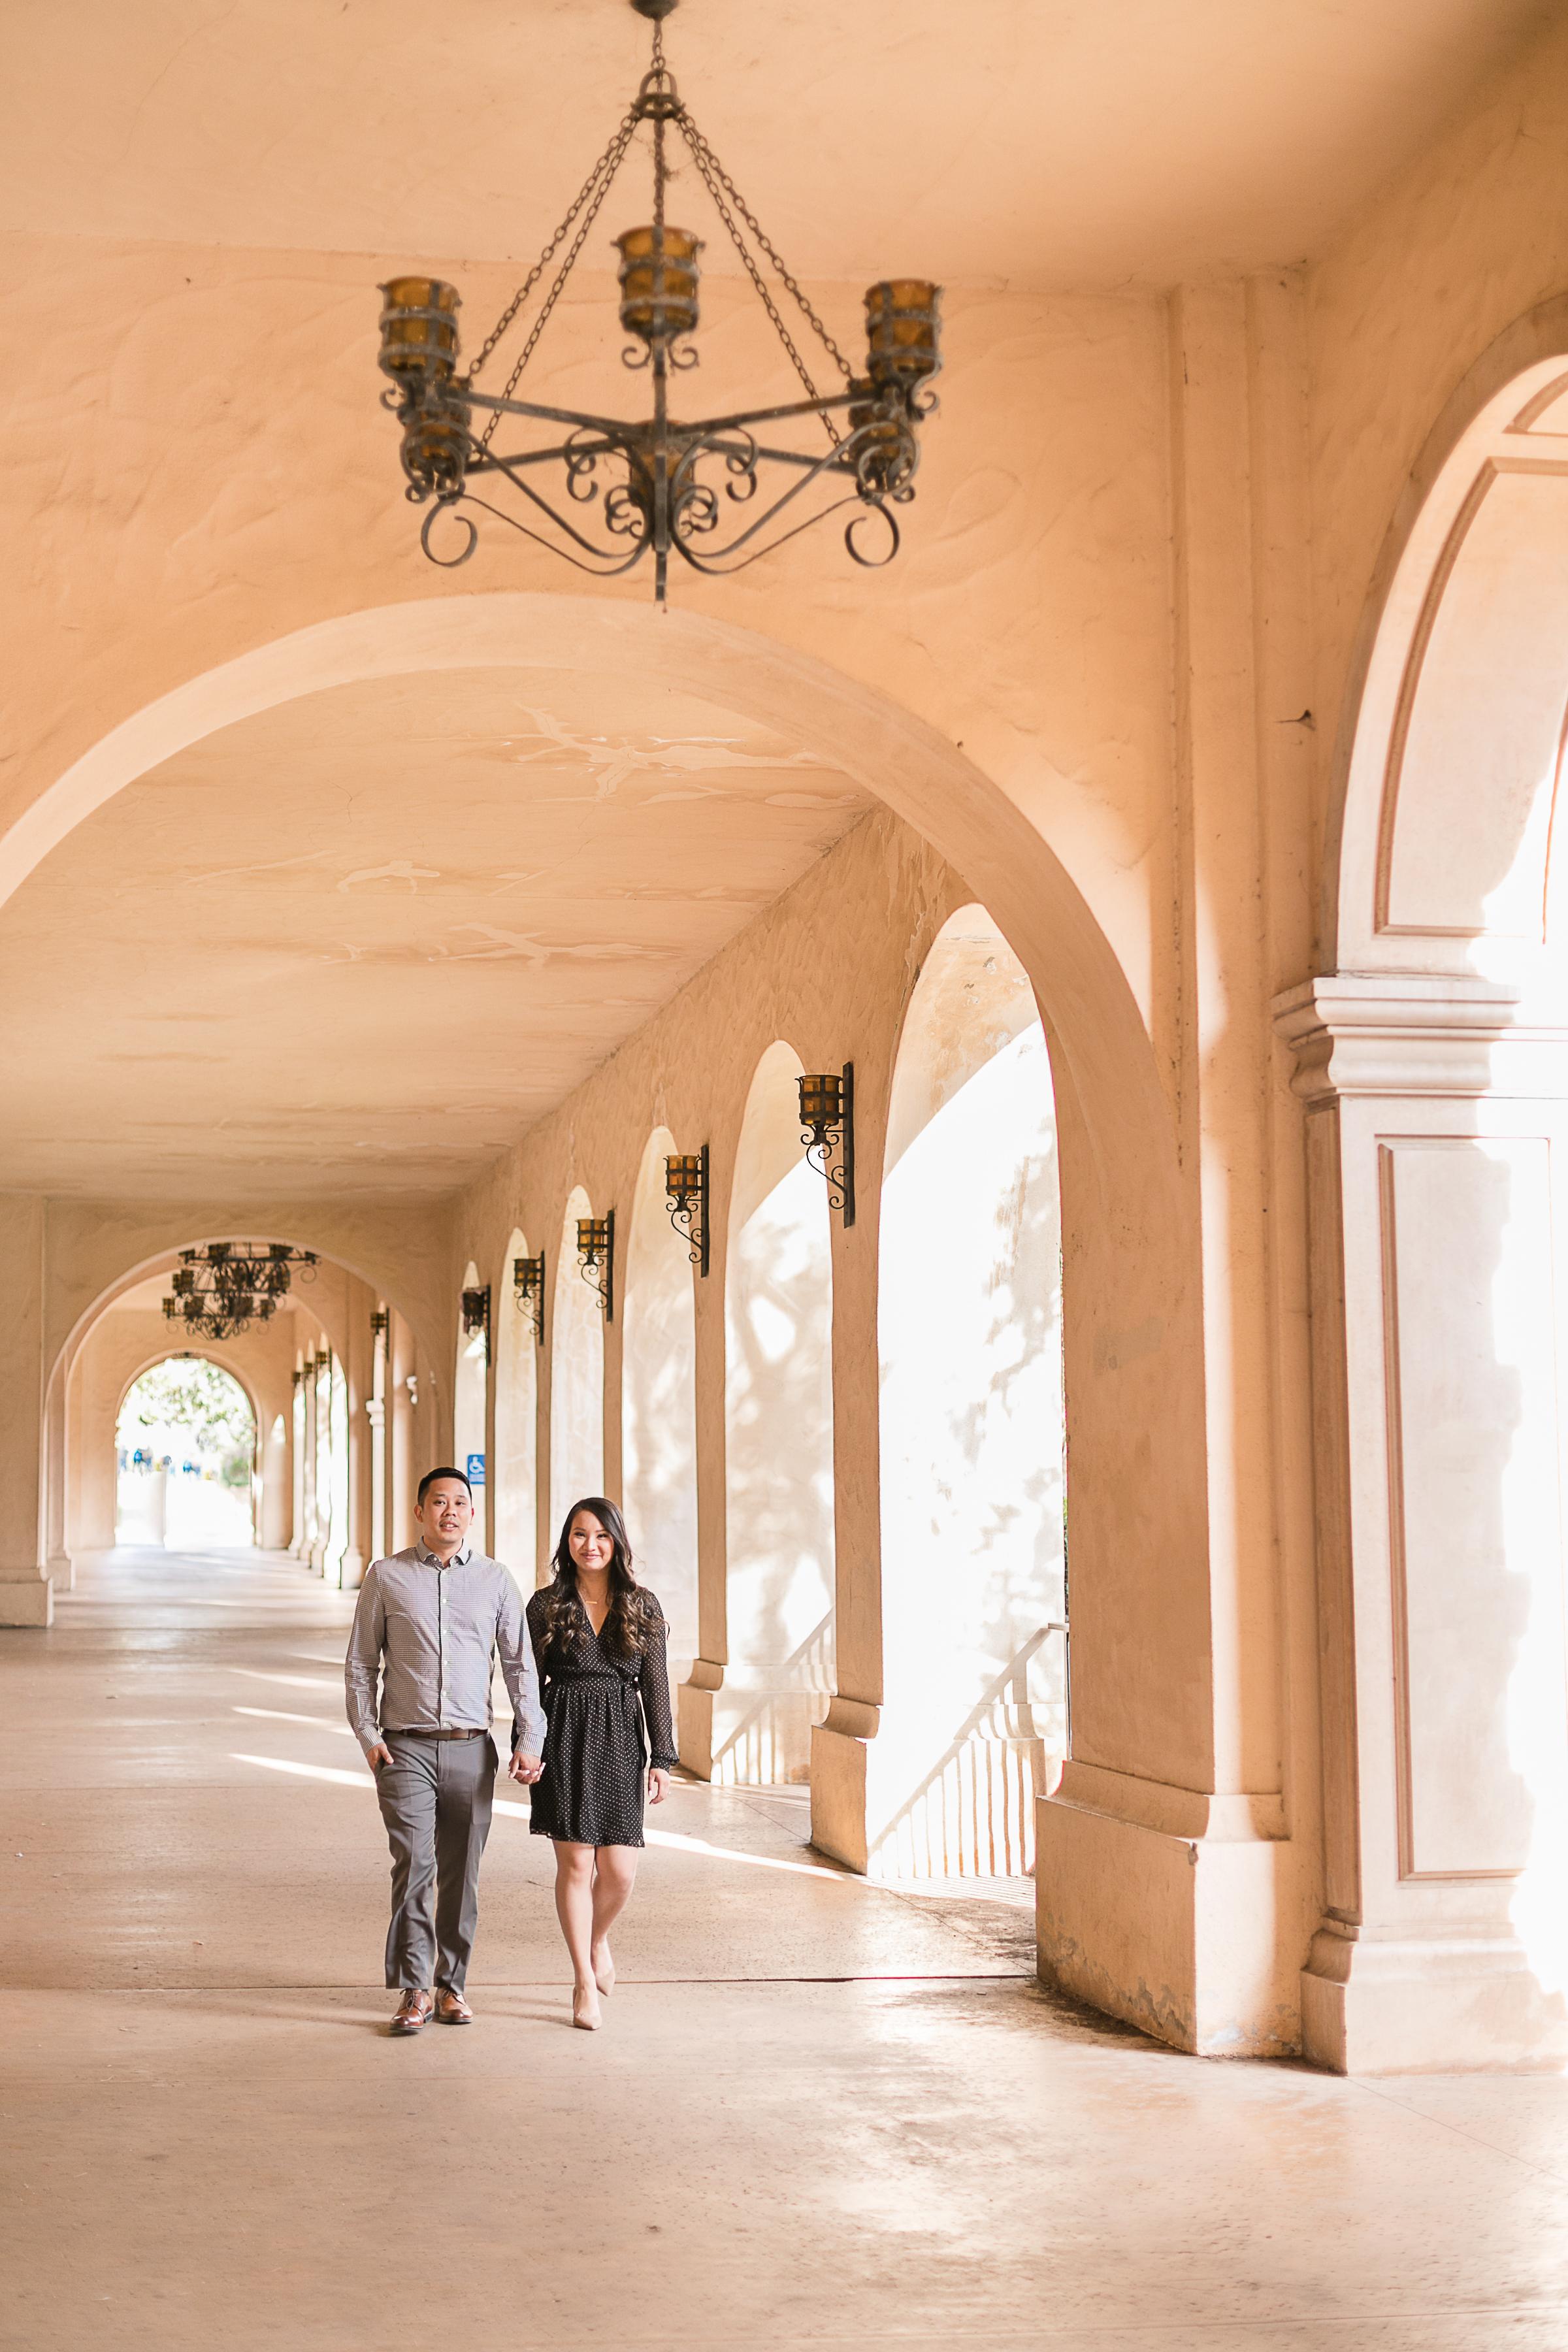 Tiffany and Erick's Balboa Park and Coronado Engagement Session-10.jpg